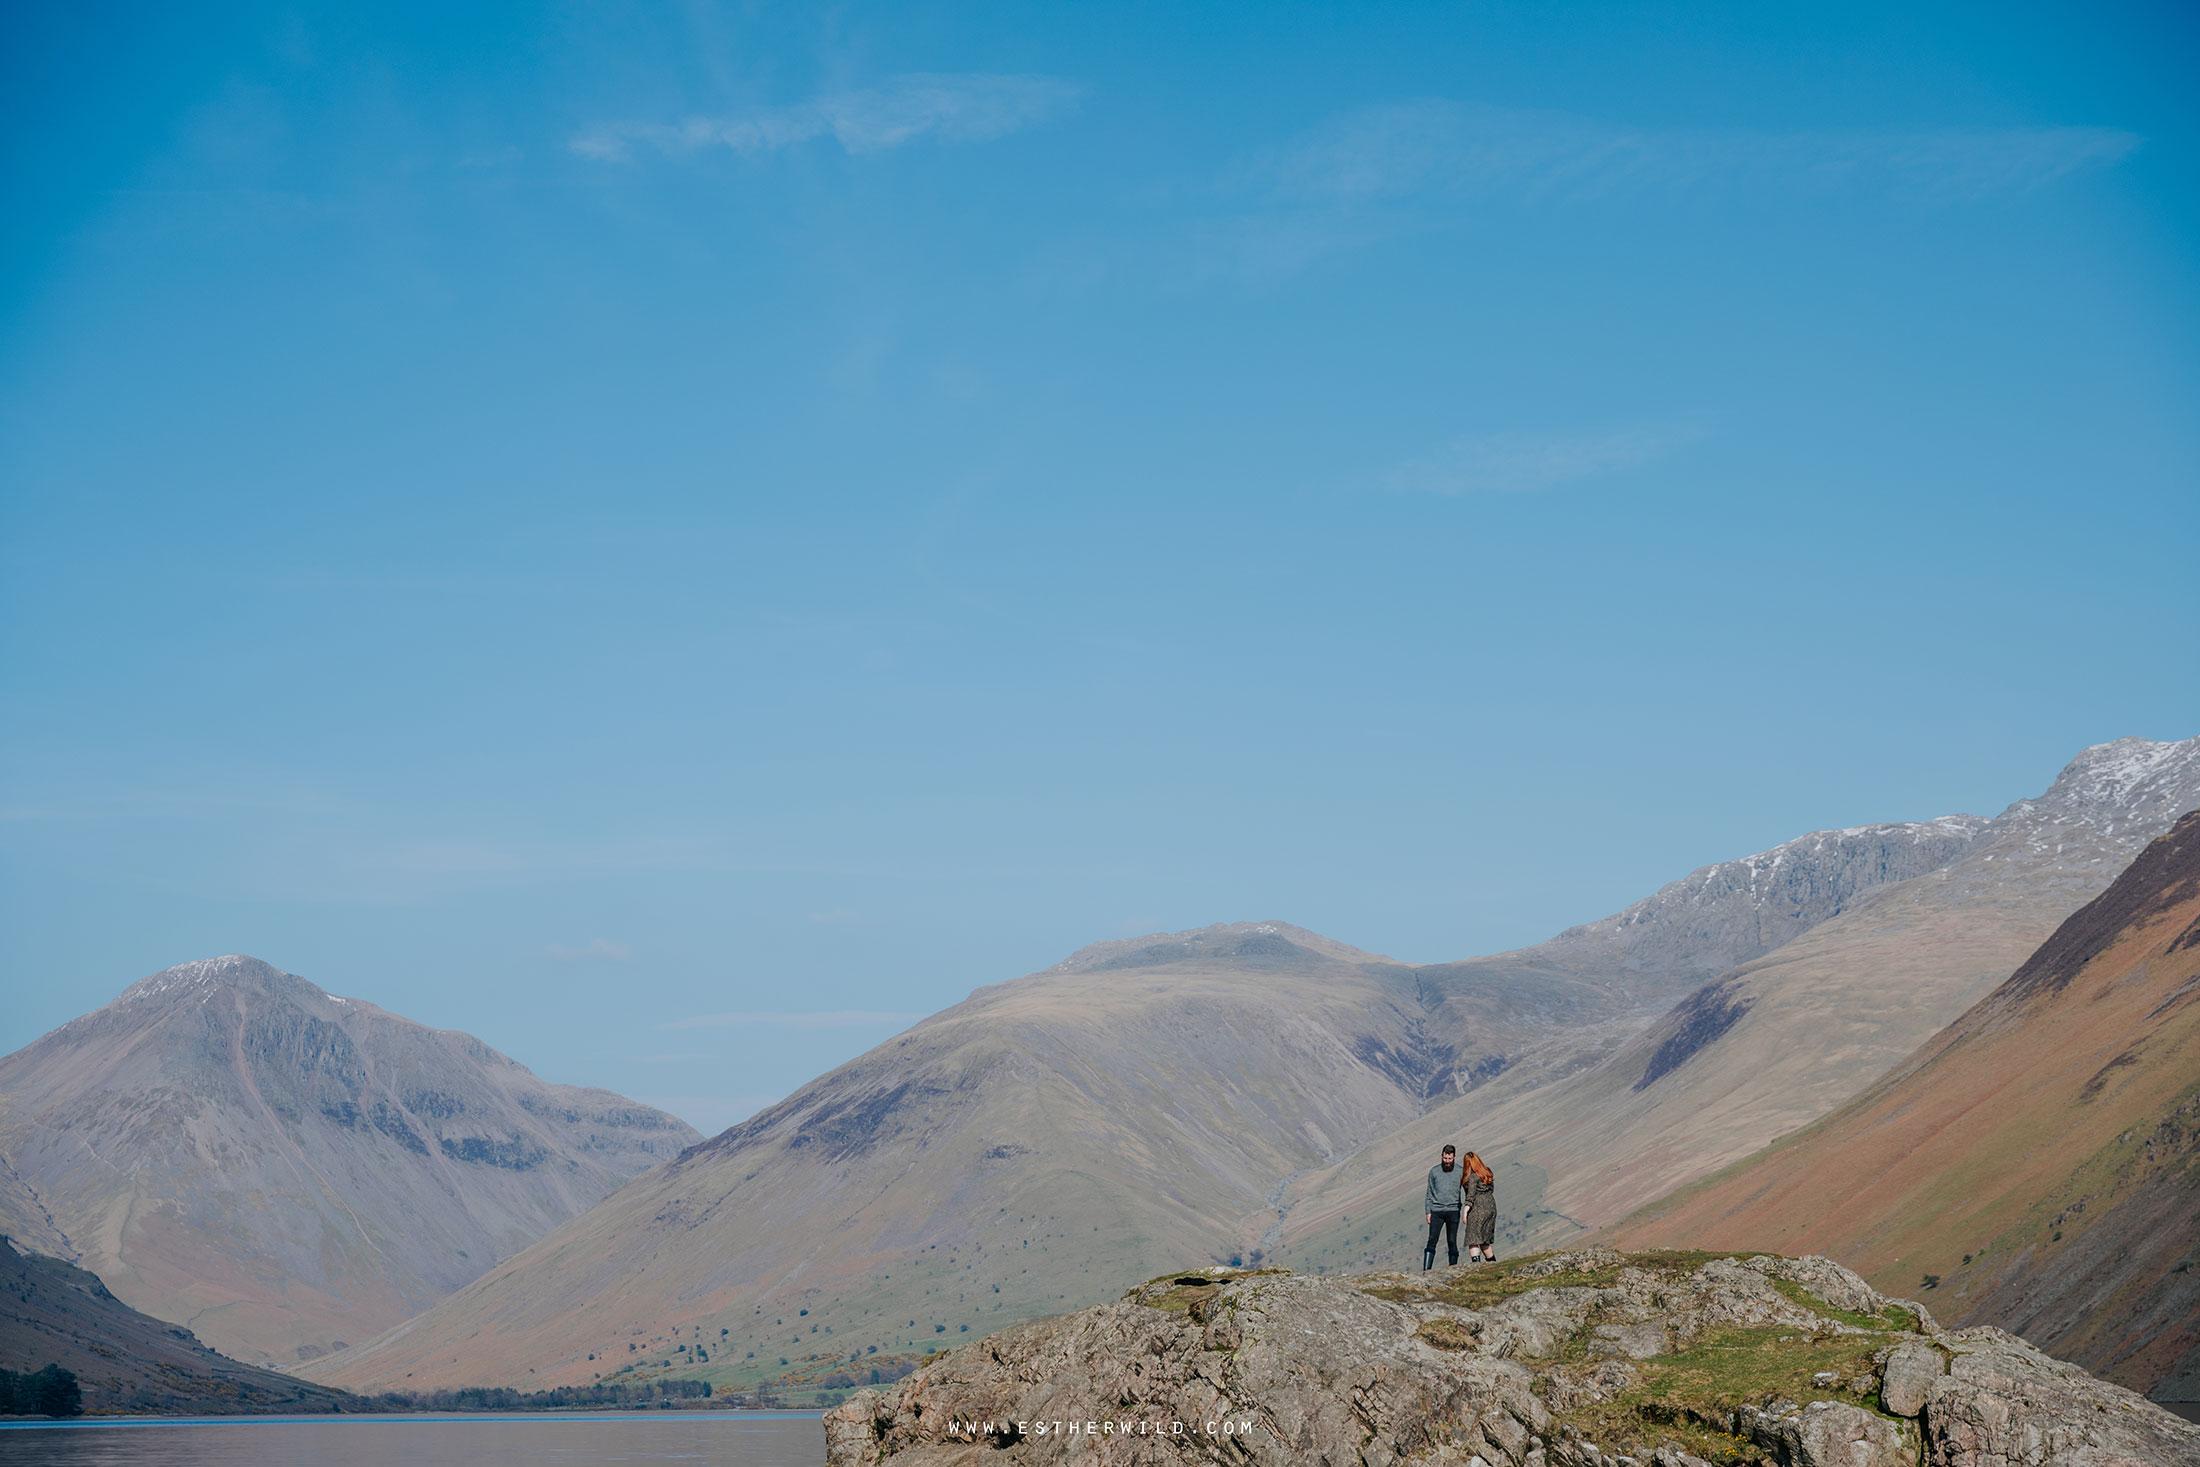 Cumbria_Lake_District_Wasdale_Wedding_Photographer_Destination_Engagement_Anniversary_Esther_Wild_IMG_3452.jpg